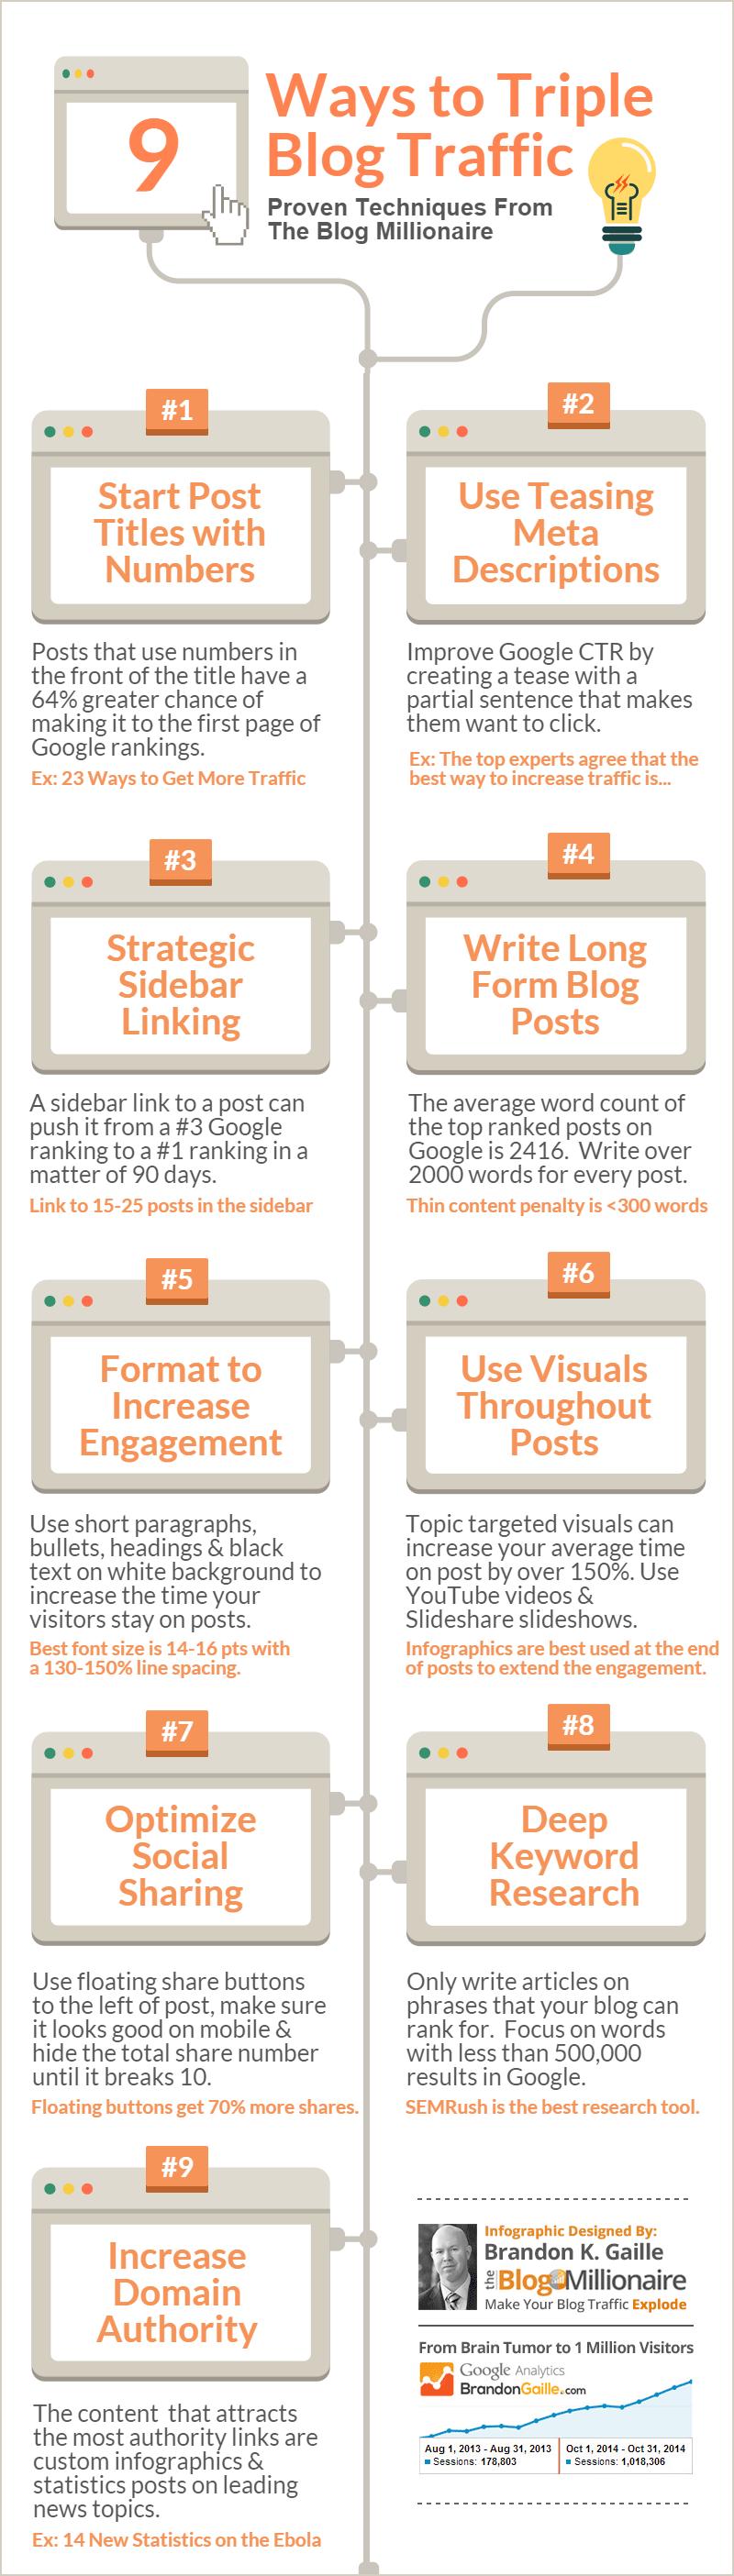 9-Ways-to-Triple-Blog-Traffic